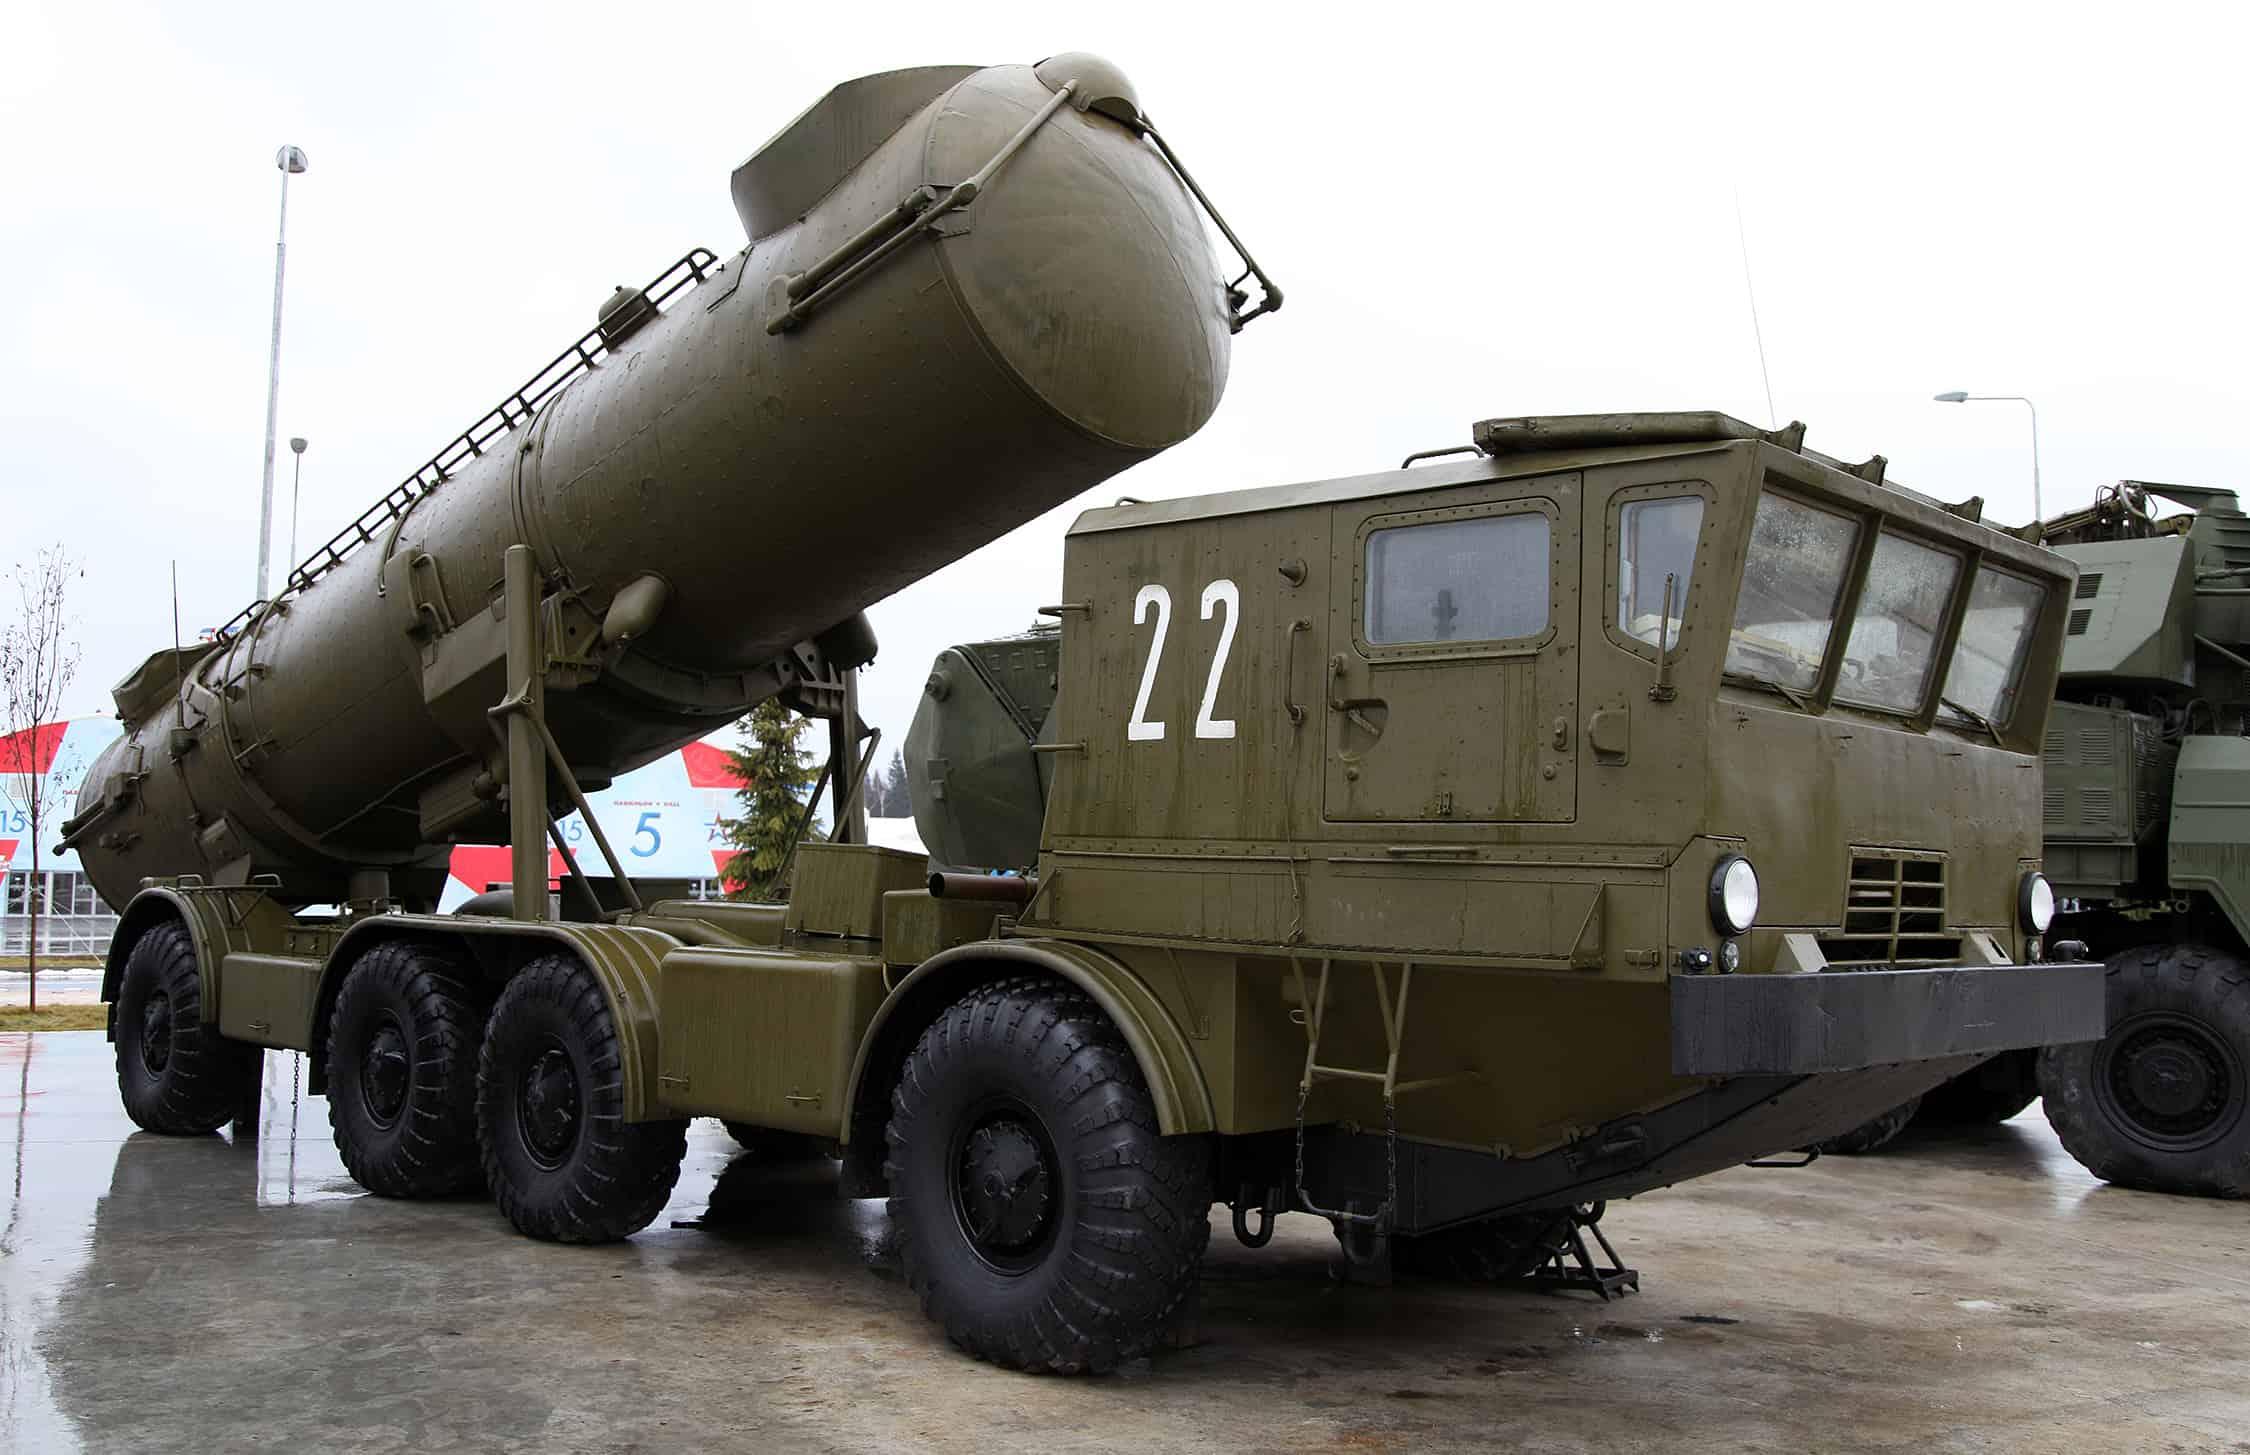 Береговий ракетний комплекс 4К44 Редут